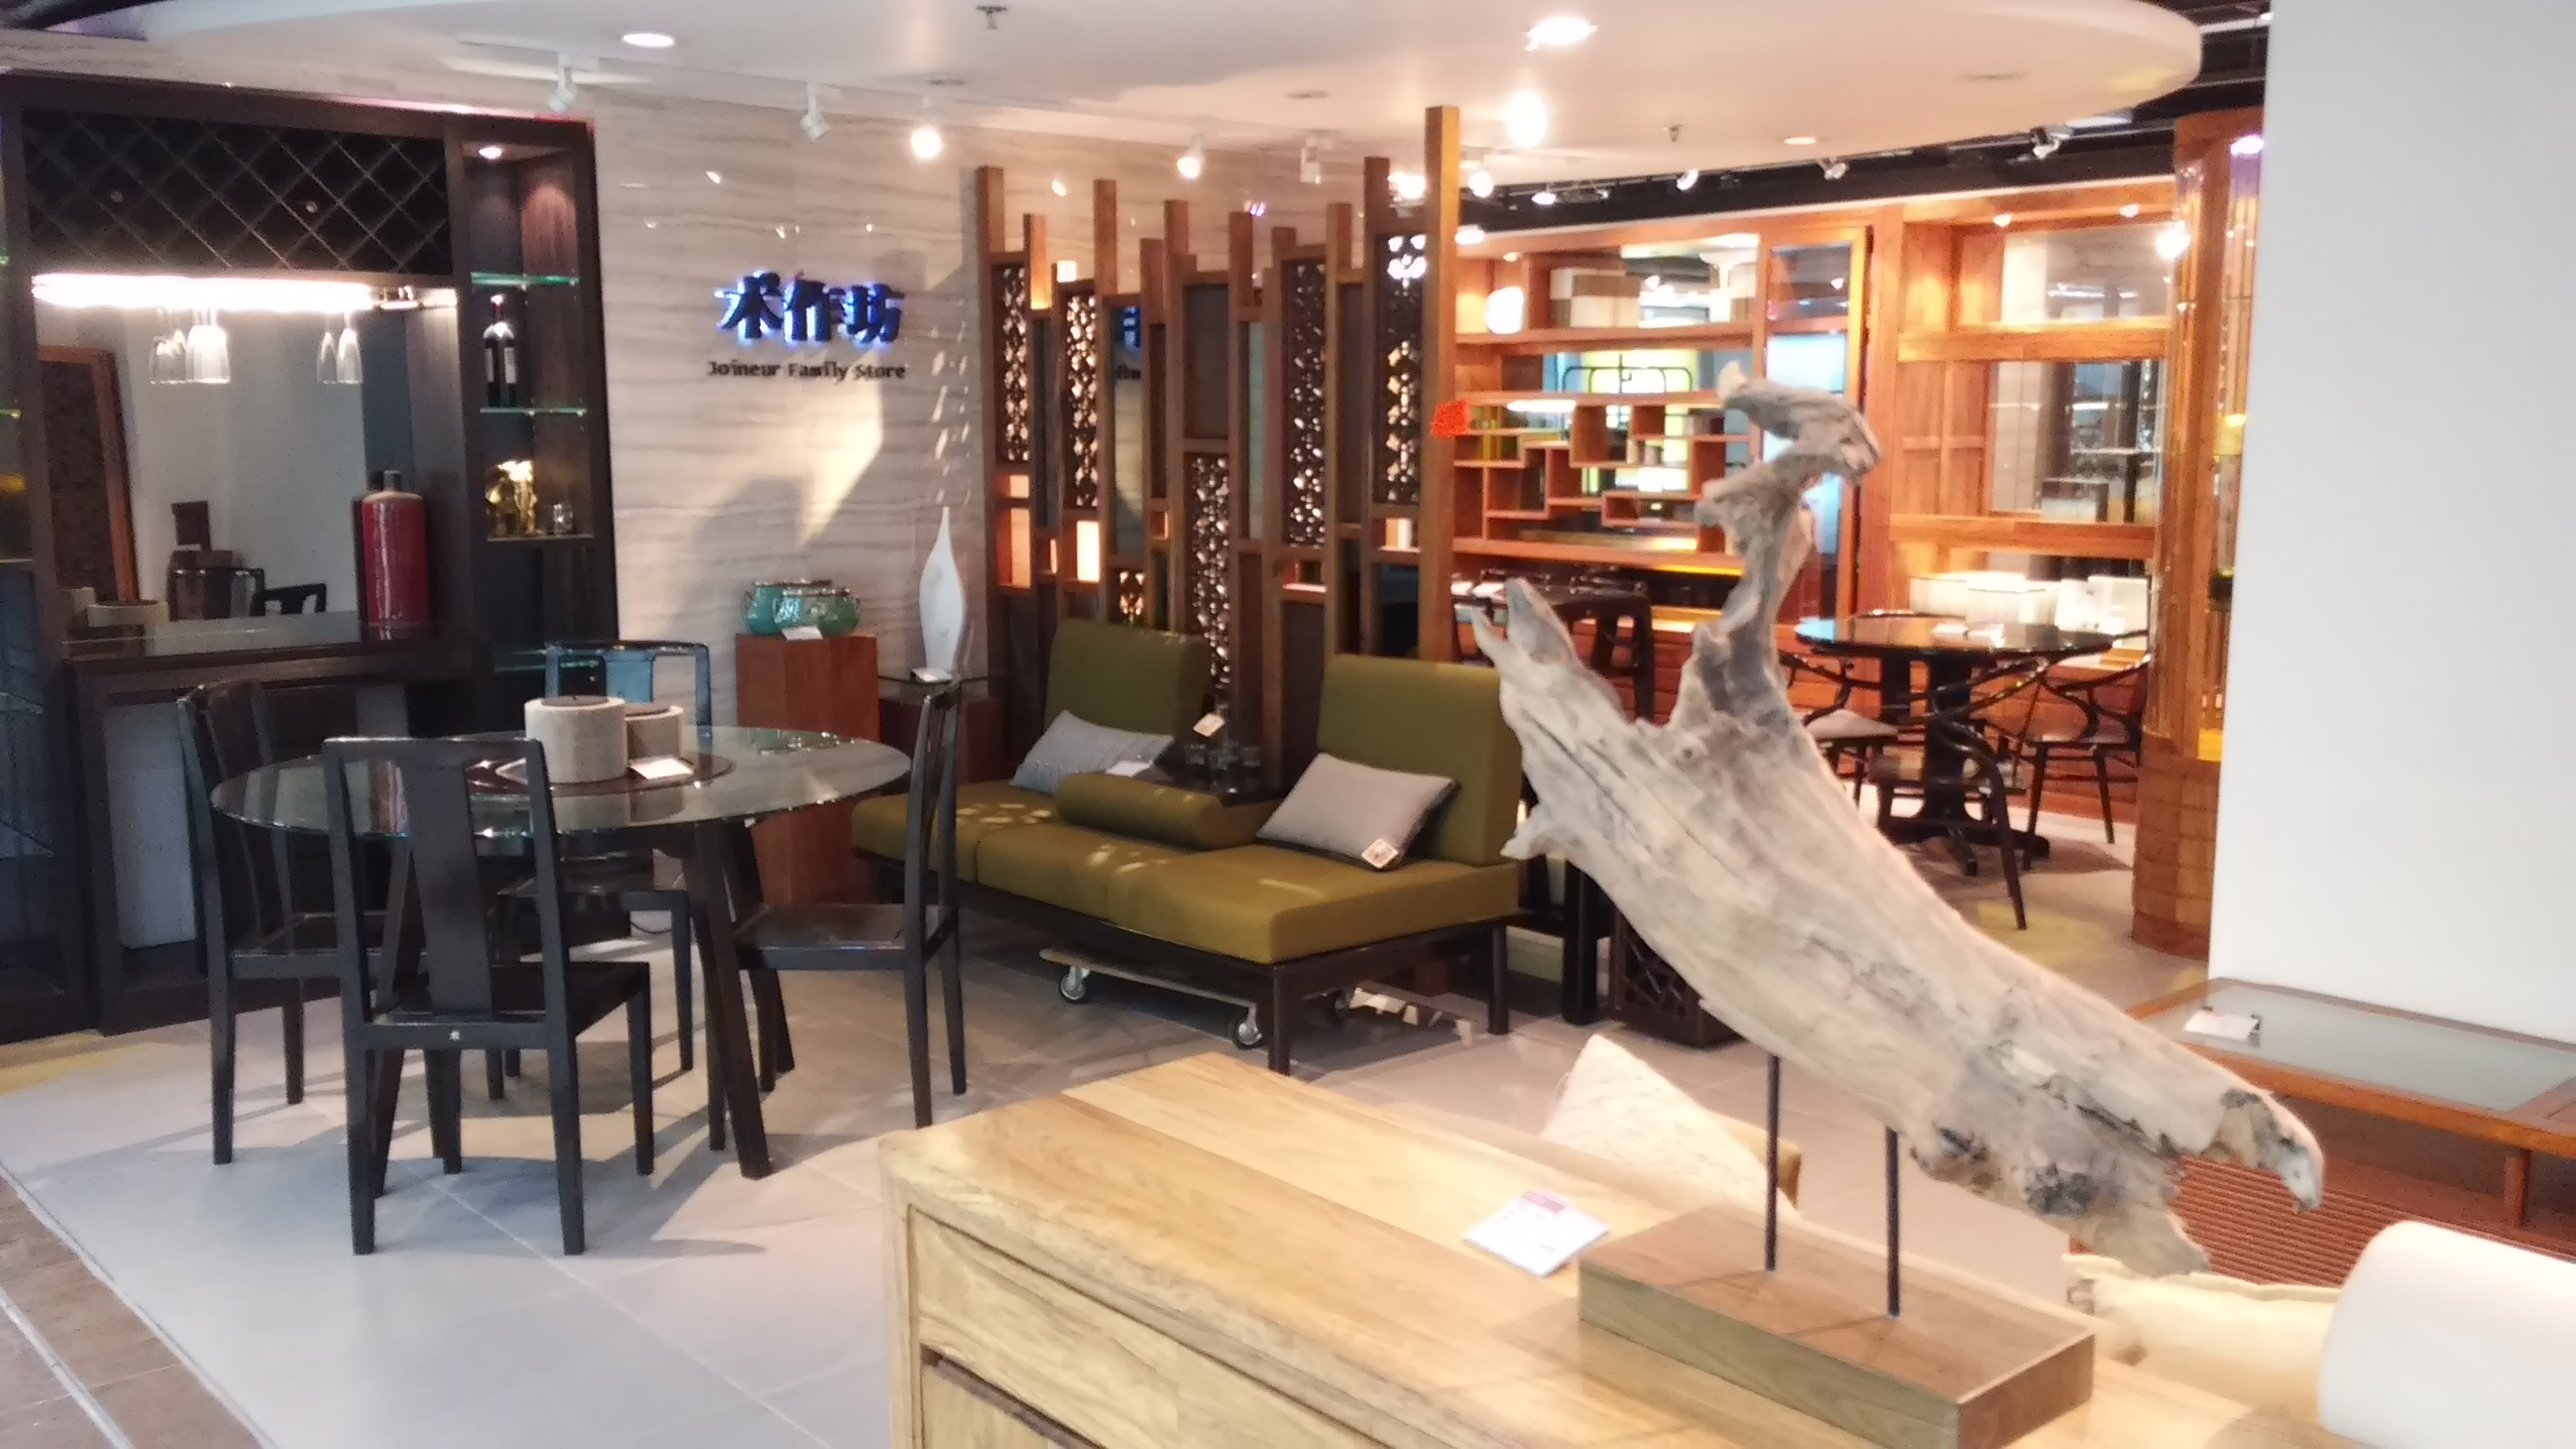 file hk kln bay emax home shopping mall furniture shop nov